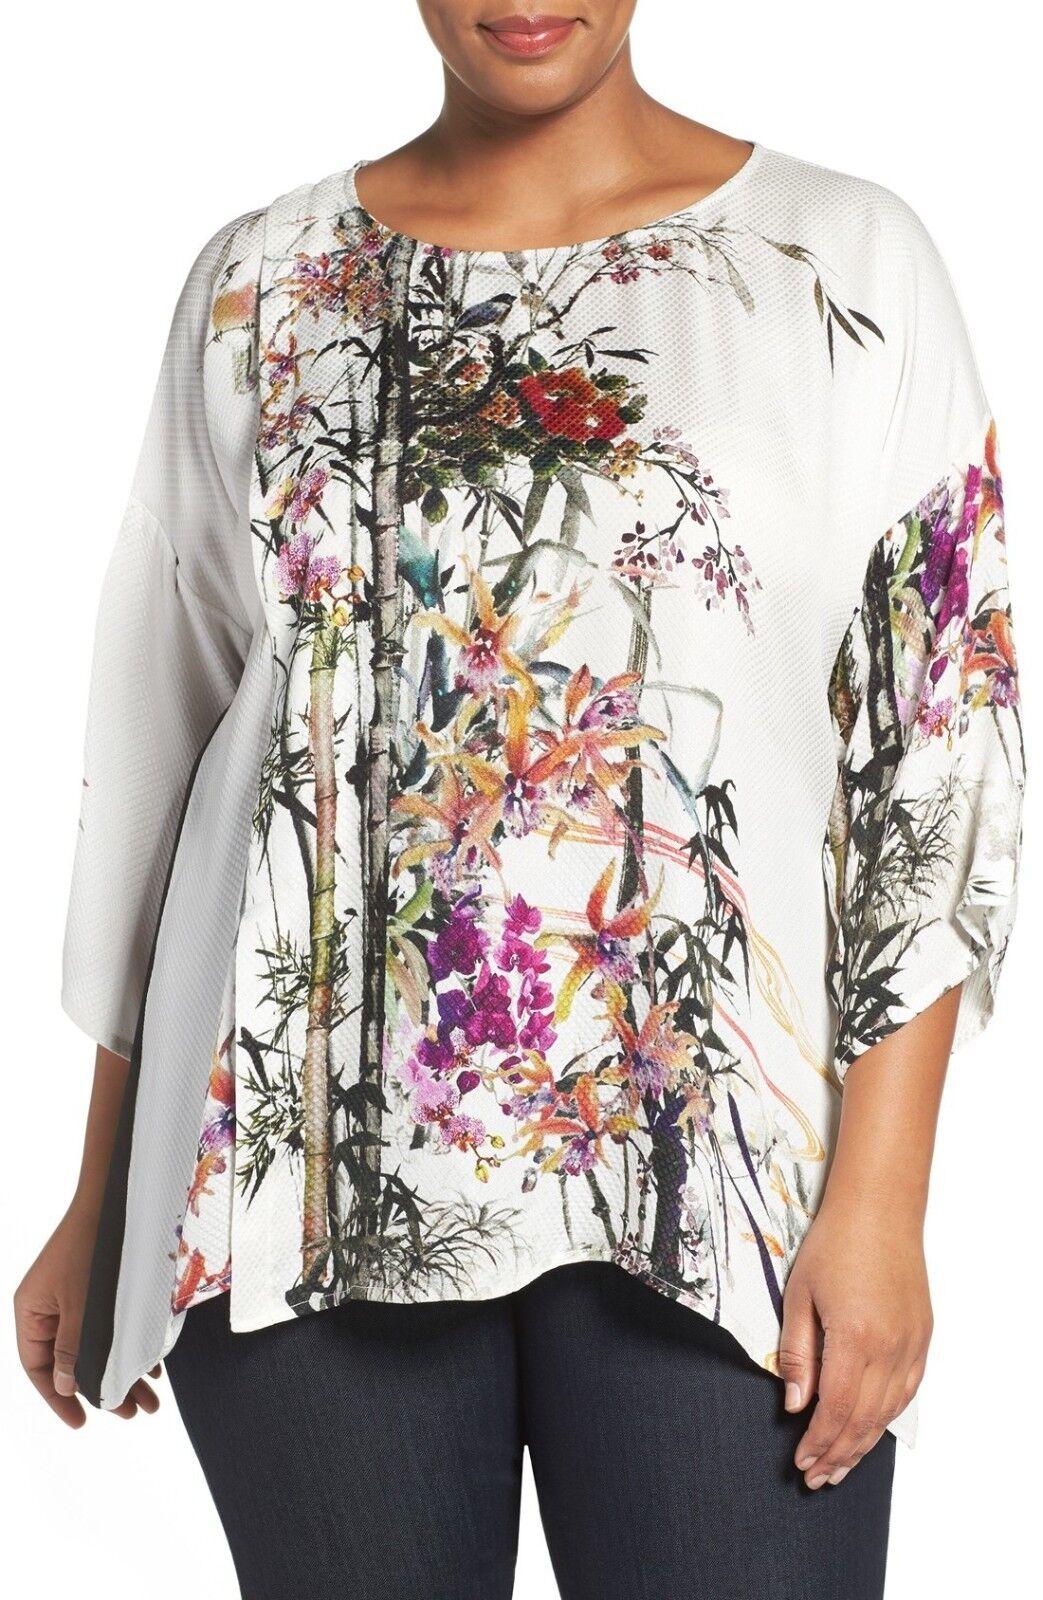 Citron Clothing 100% Silk Art To Wear Weiß Floral  Fukure Blouse Plus 0X